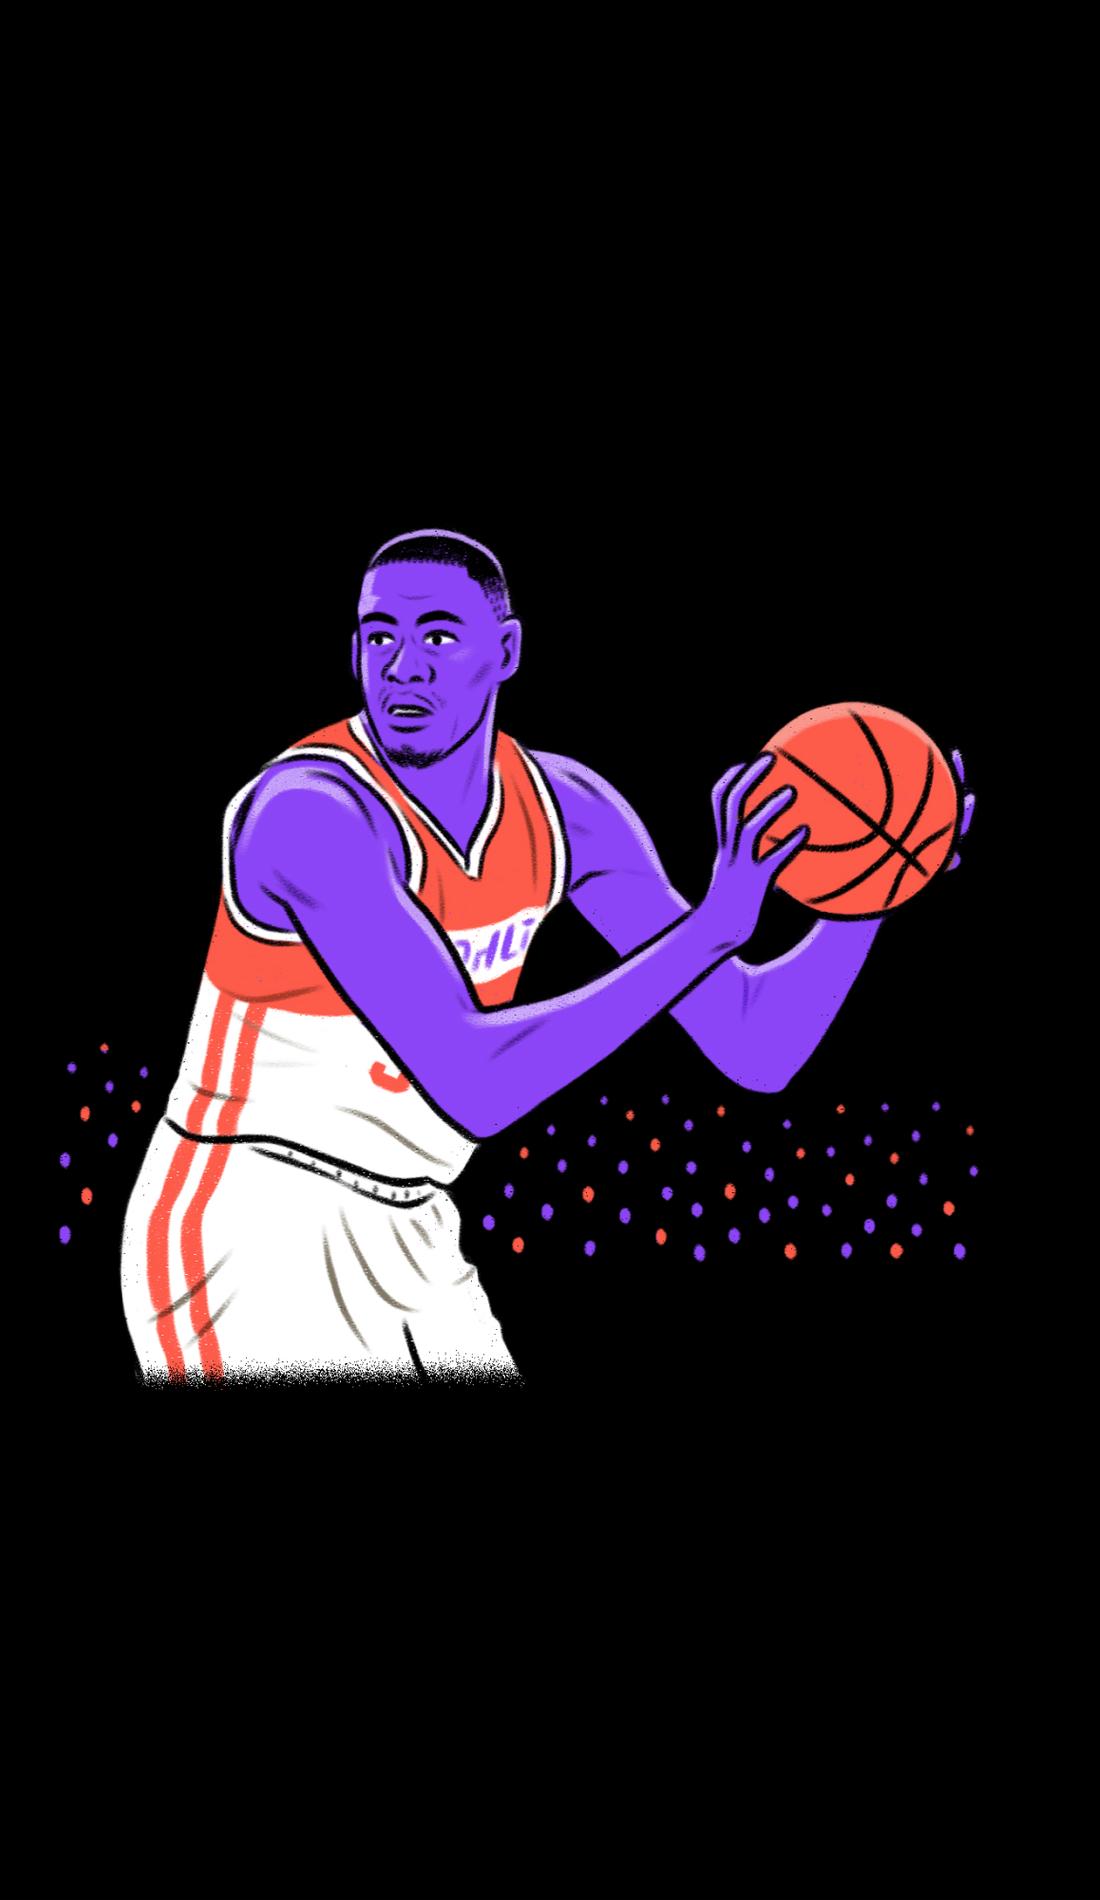 A Robert Morris Colonials Basketball live event